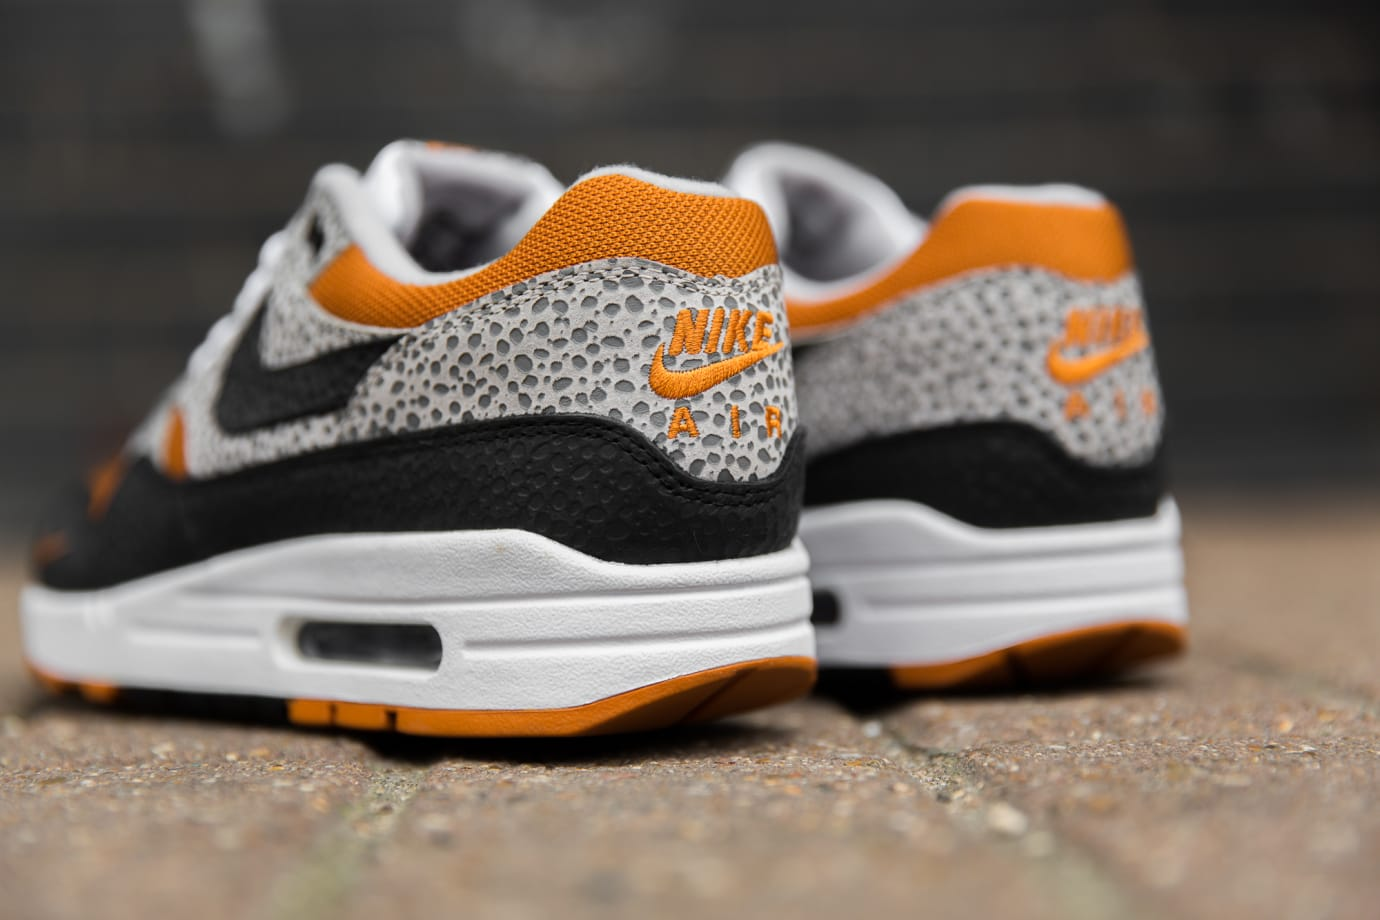 c6e53672ea8b9 Size  x Nike Air Max 1  Safari  Sneaker Preview and Release Date ...